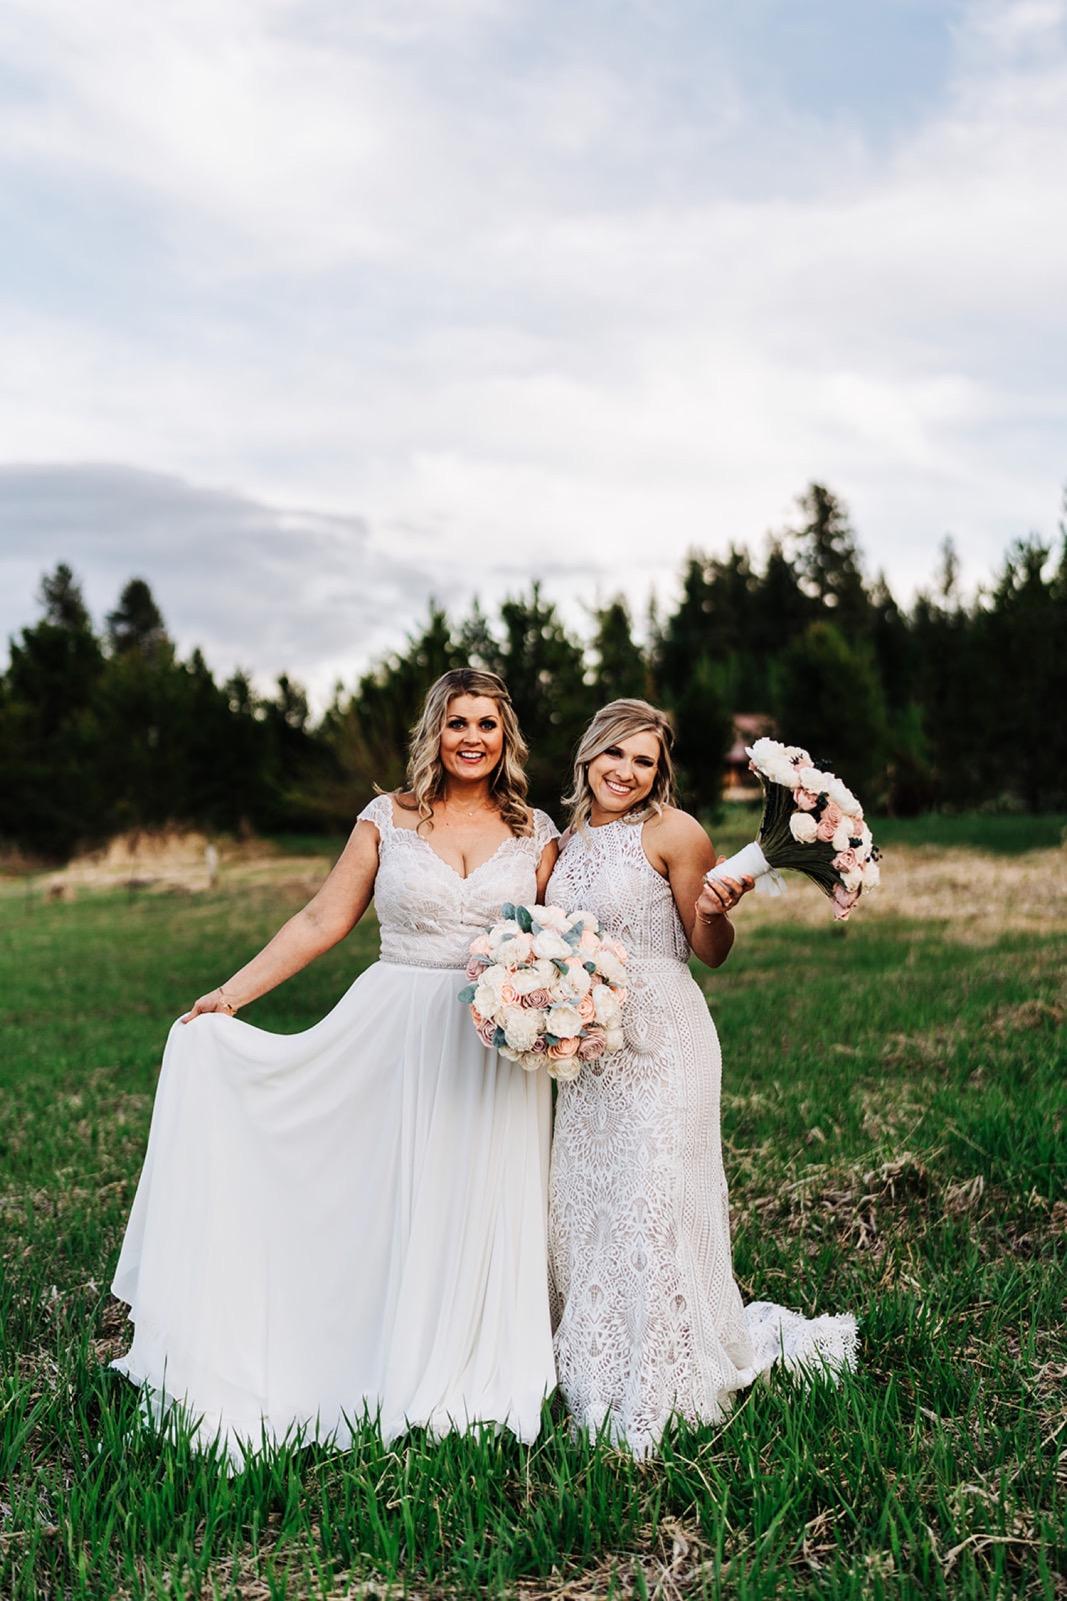 190_falissa_heather_wedding-538.jpg